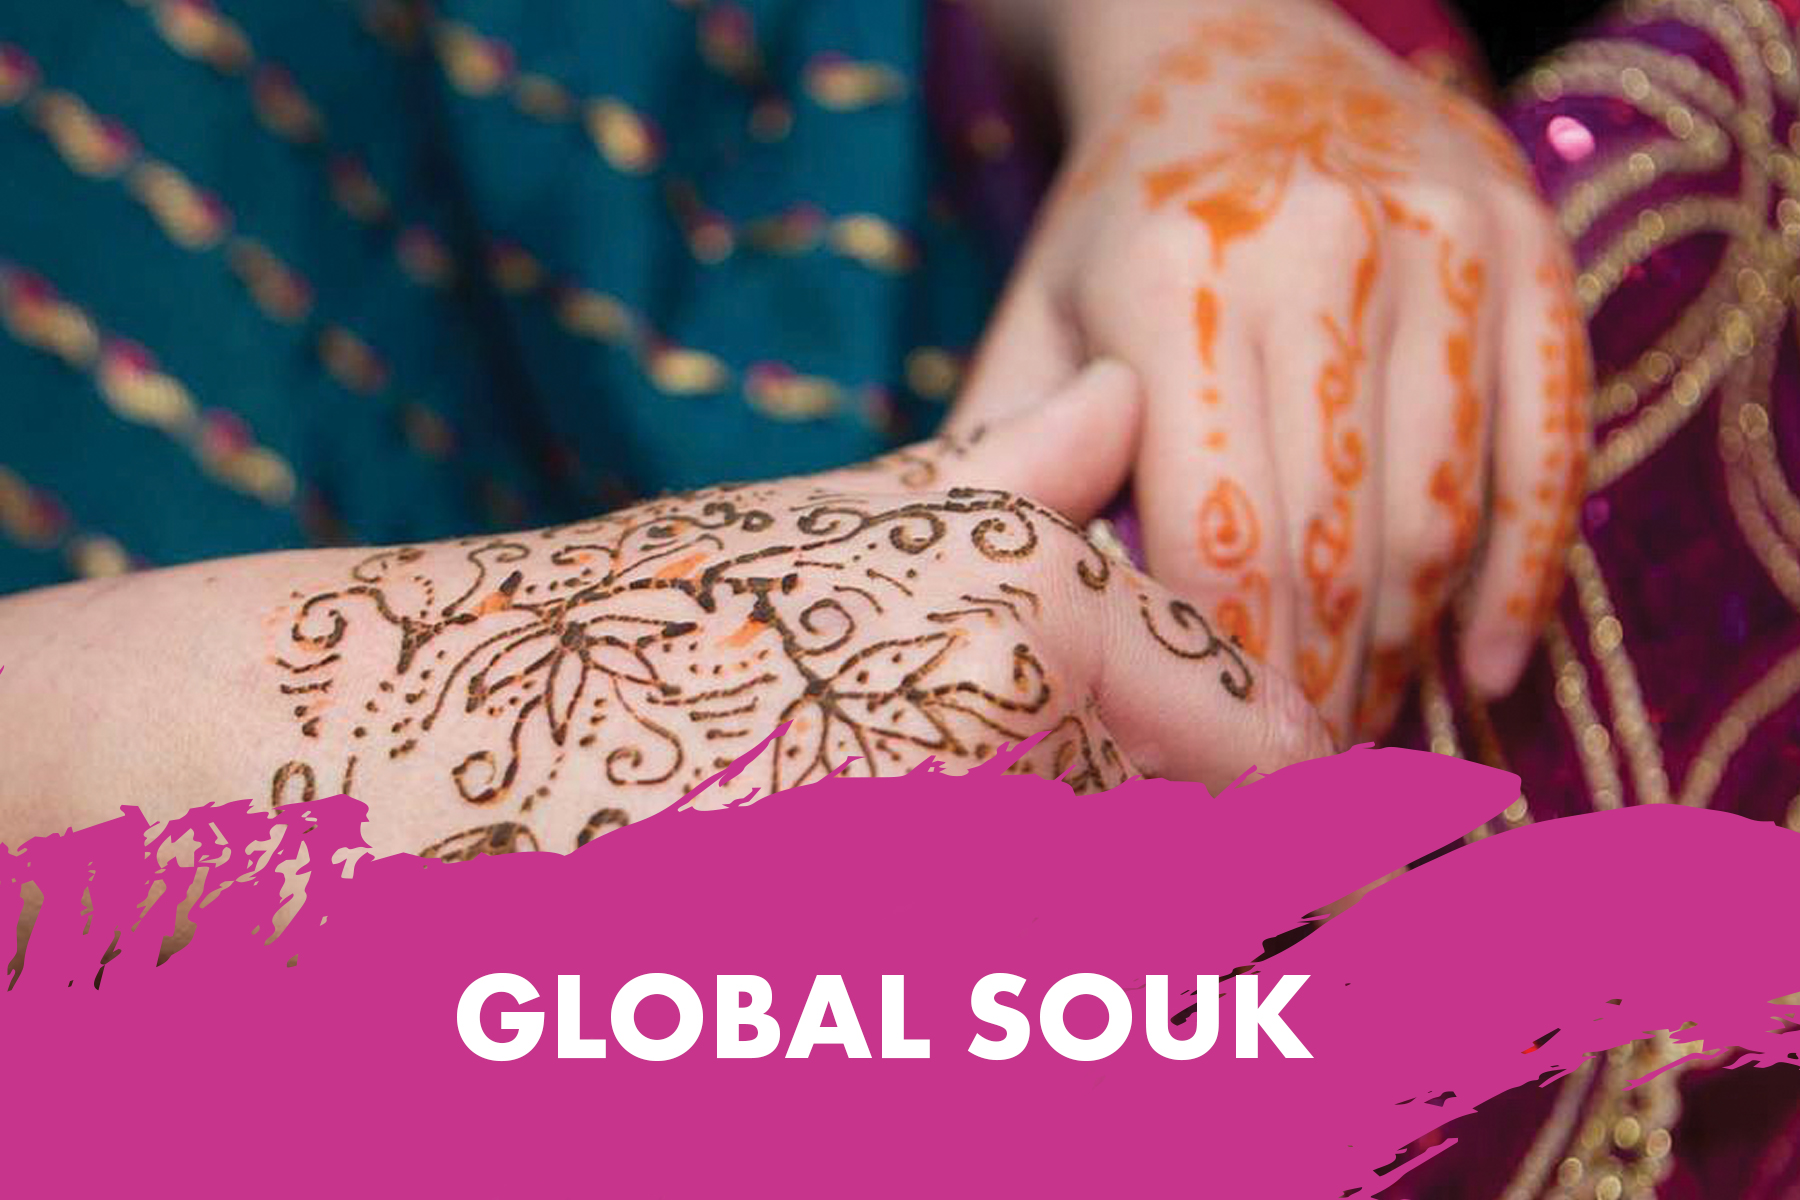 global-souk_large.jpg